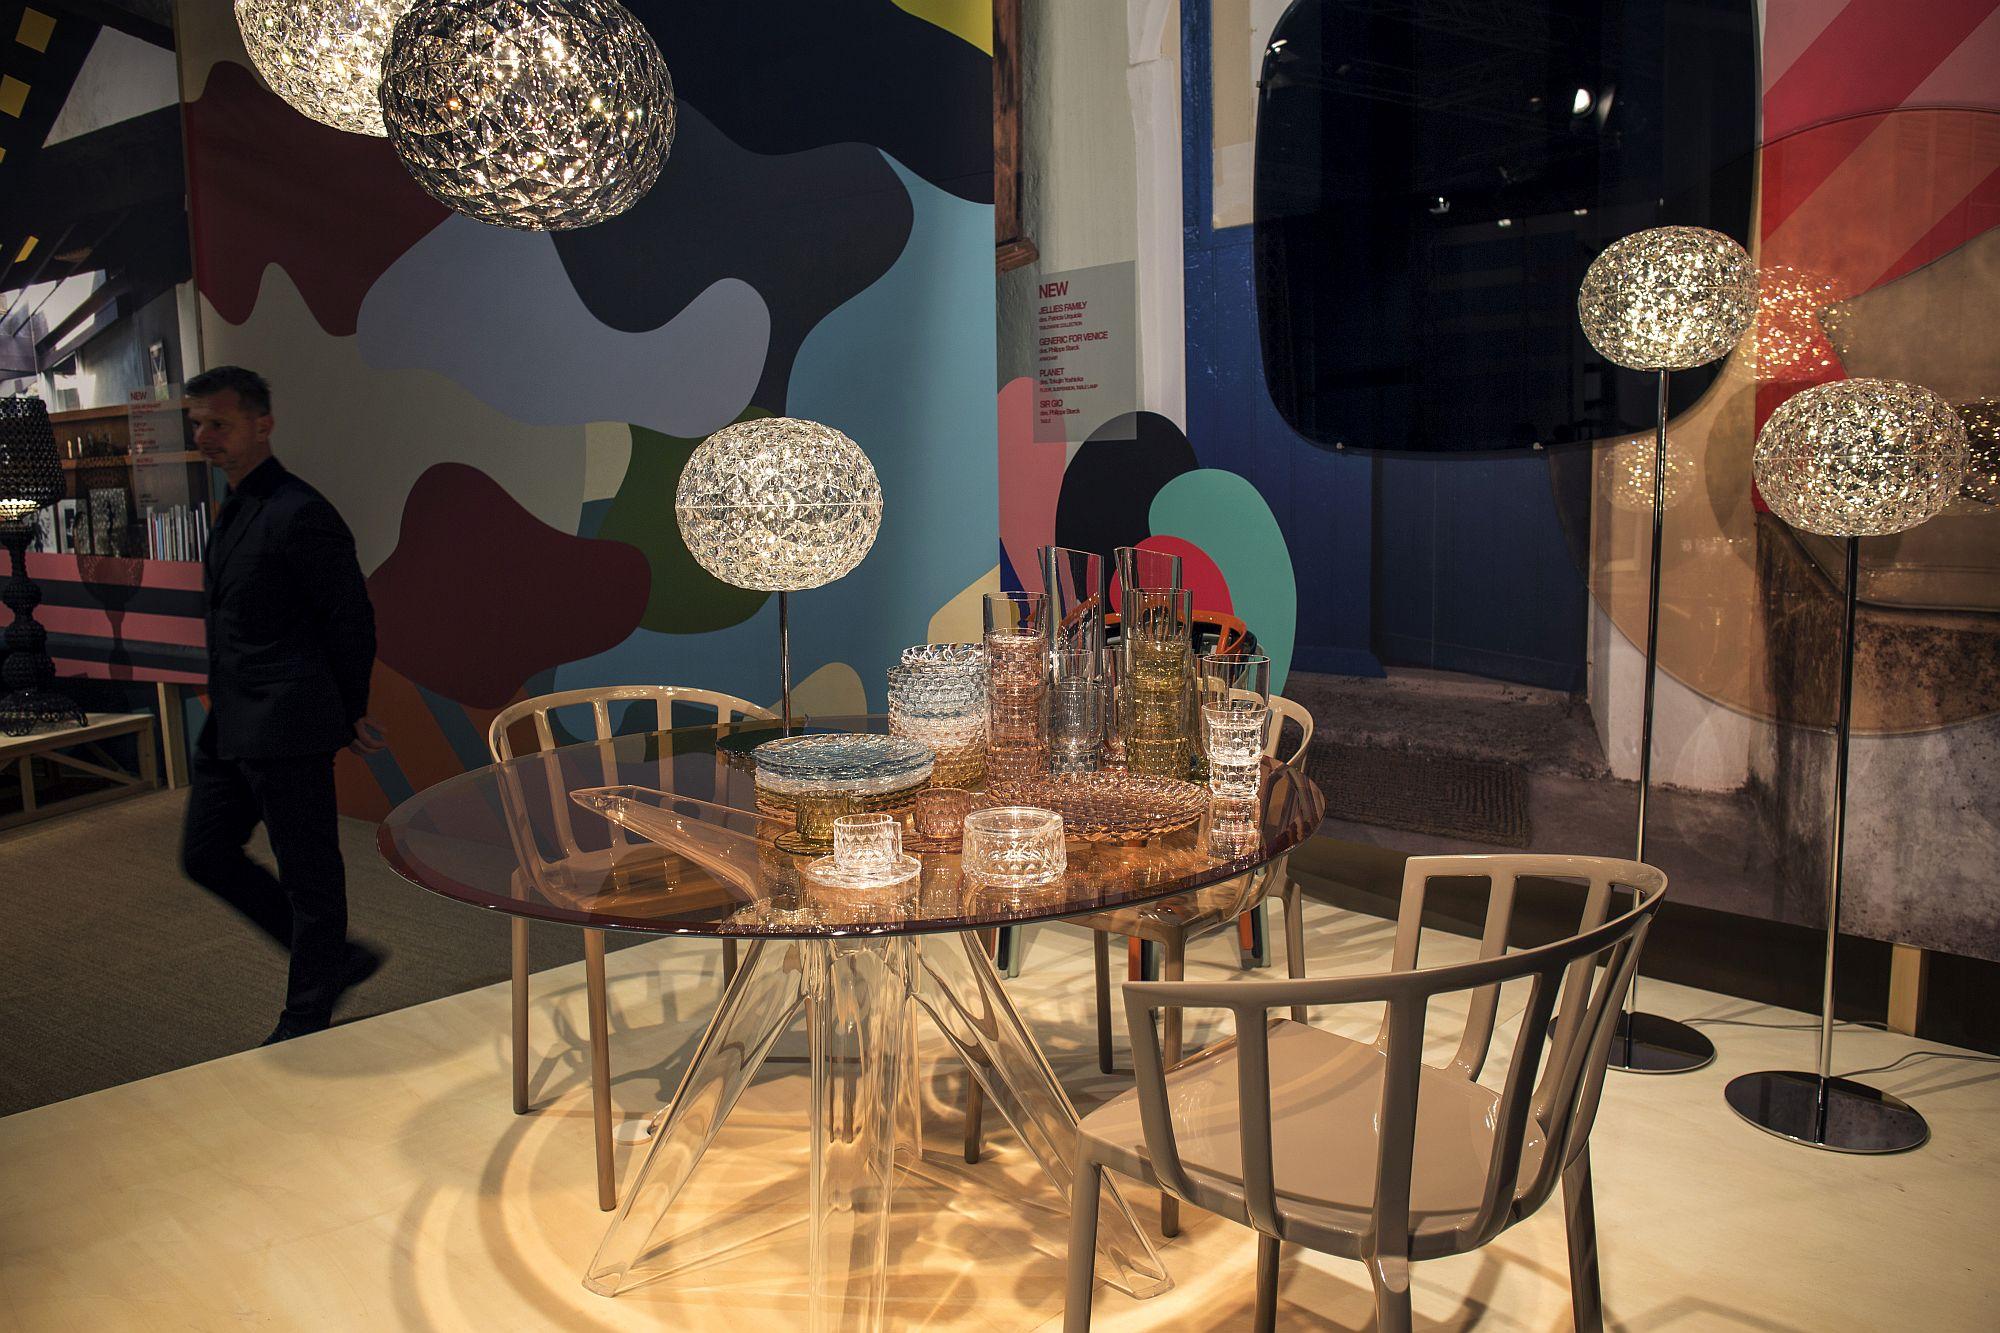 Snazzy floor lamps usher in glassy glint